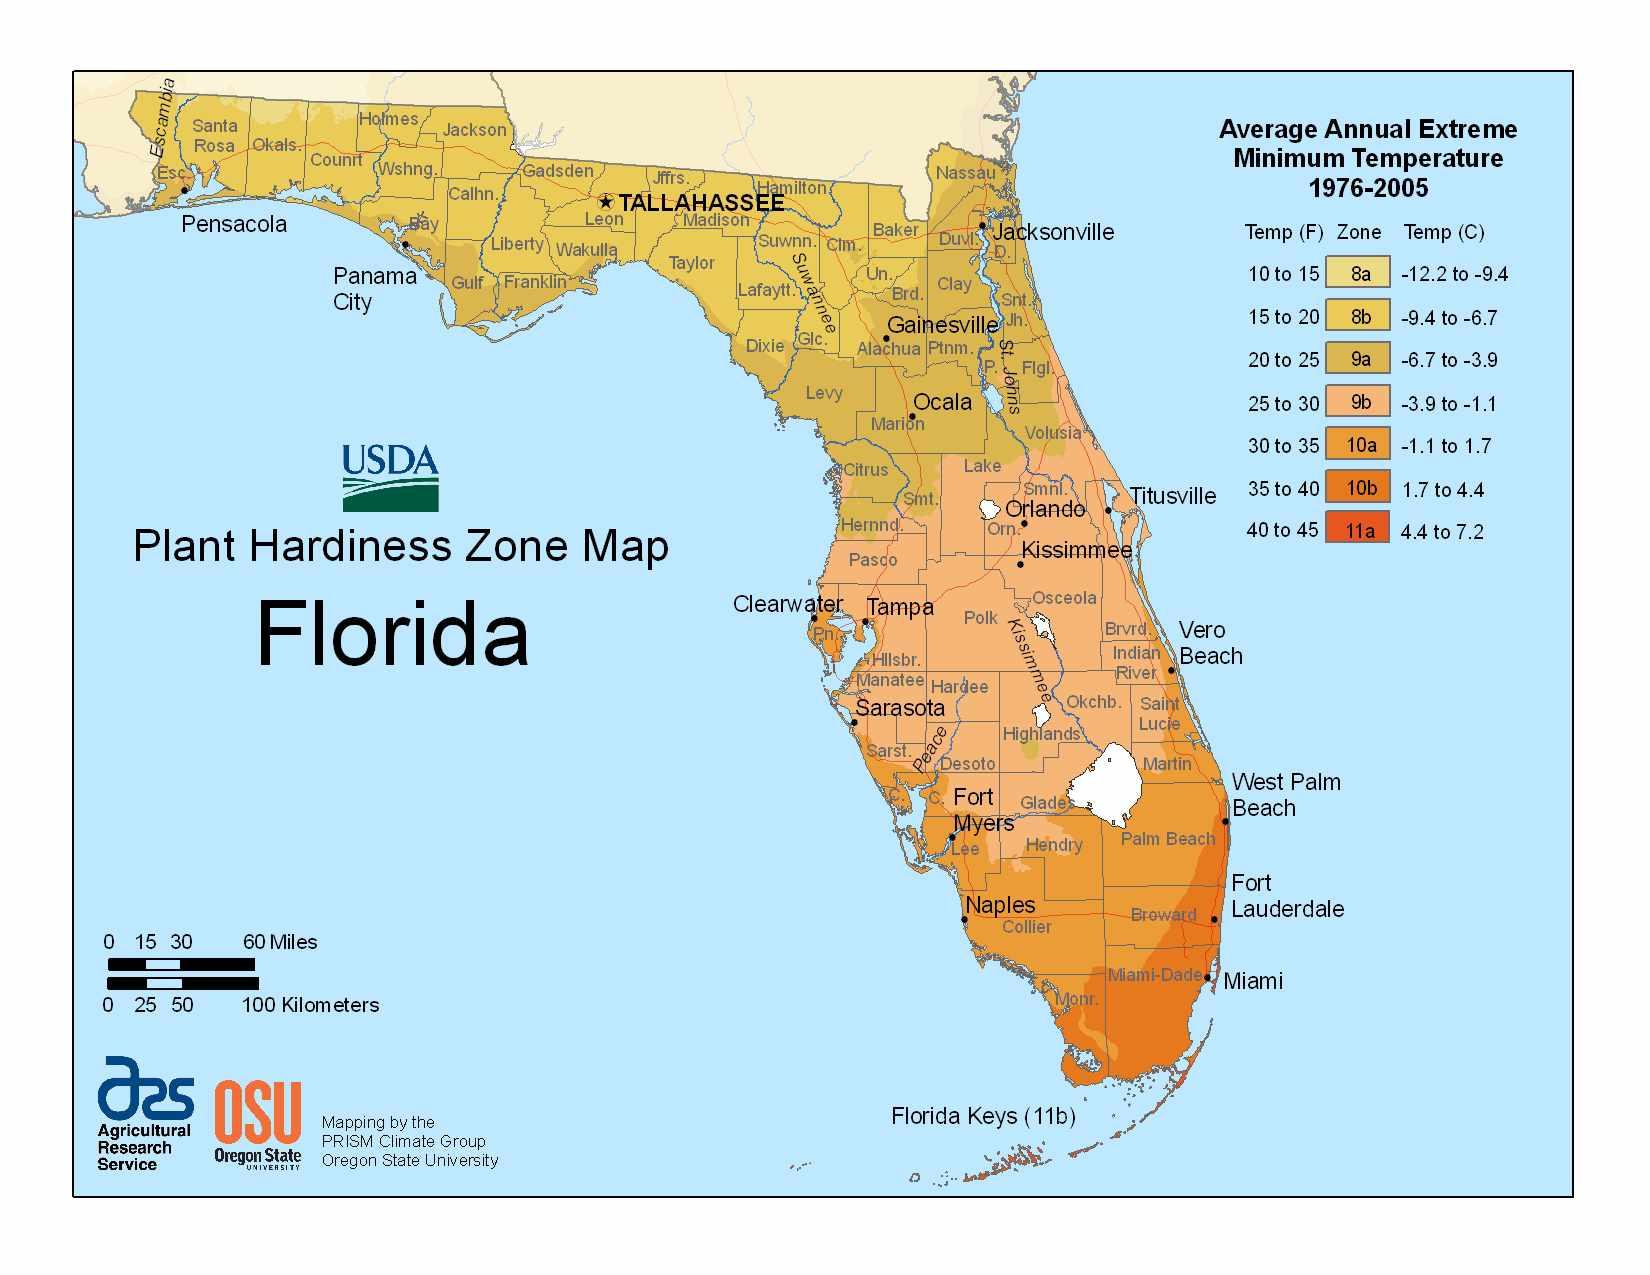 Photo of the Florida Hardiness Zones